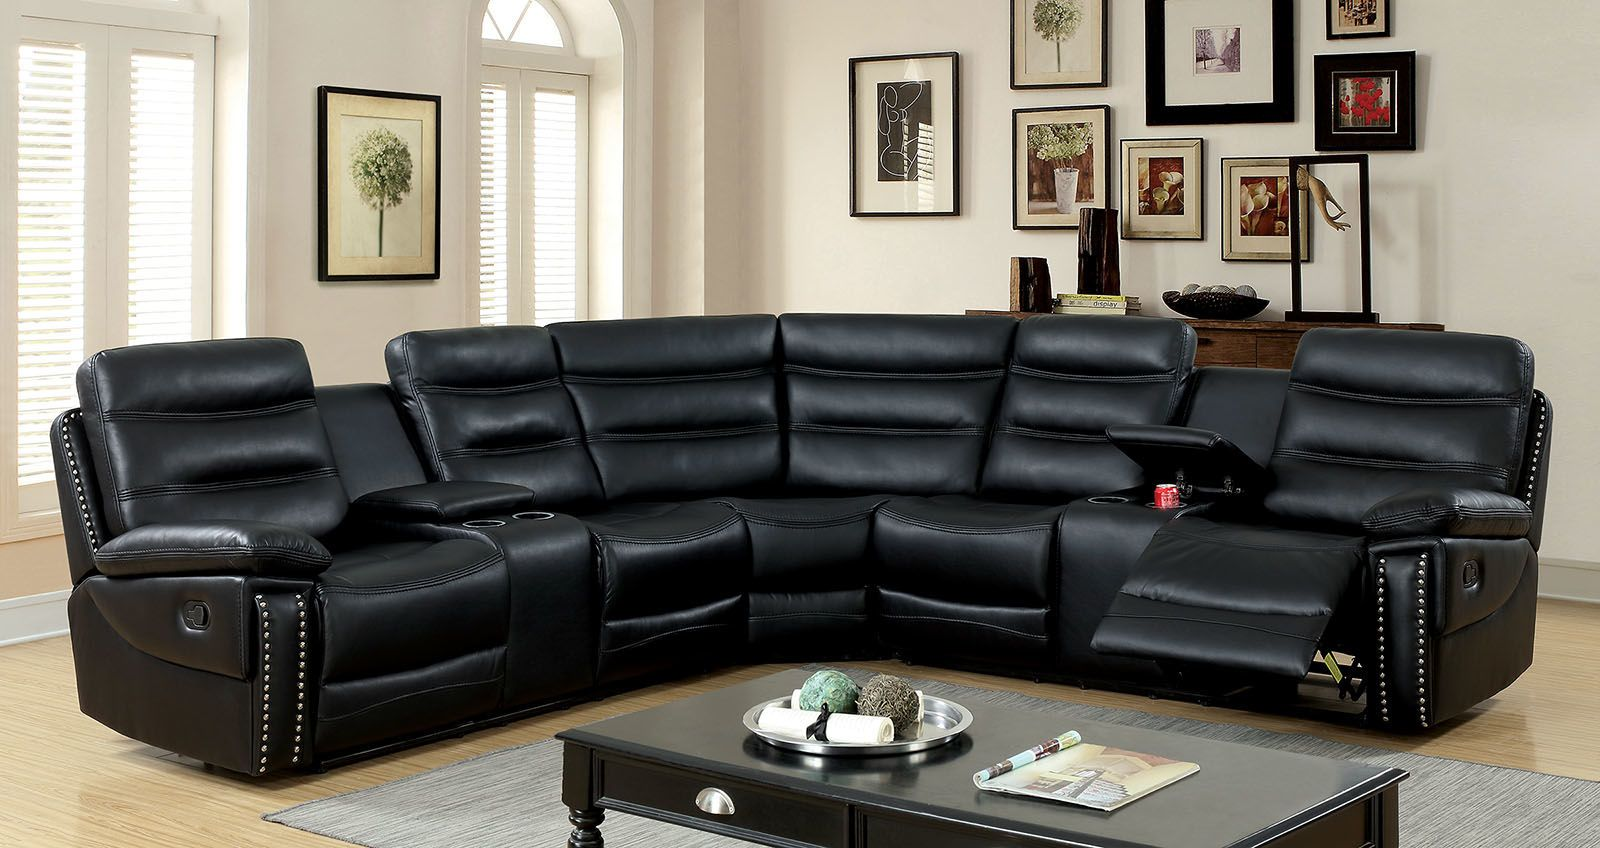 Cavan Sectional Sofa Cm6650bk Sect Furniture Of America Recliners Reclining Sectional Sectional Sofa With Recliner Sectional Sofa